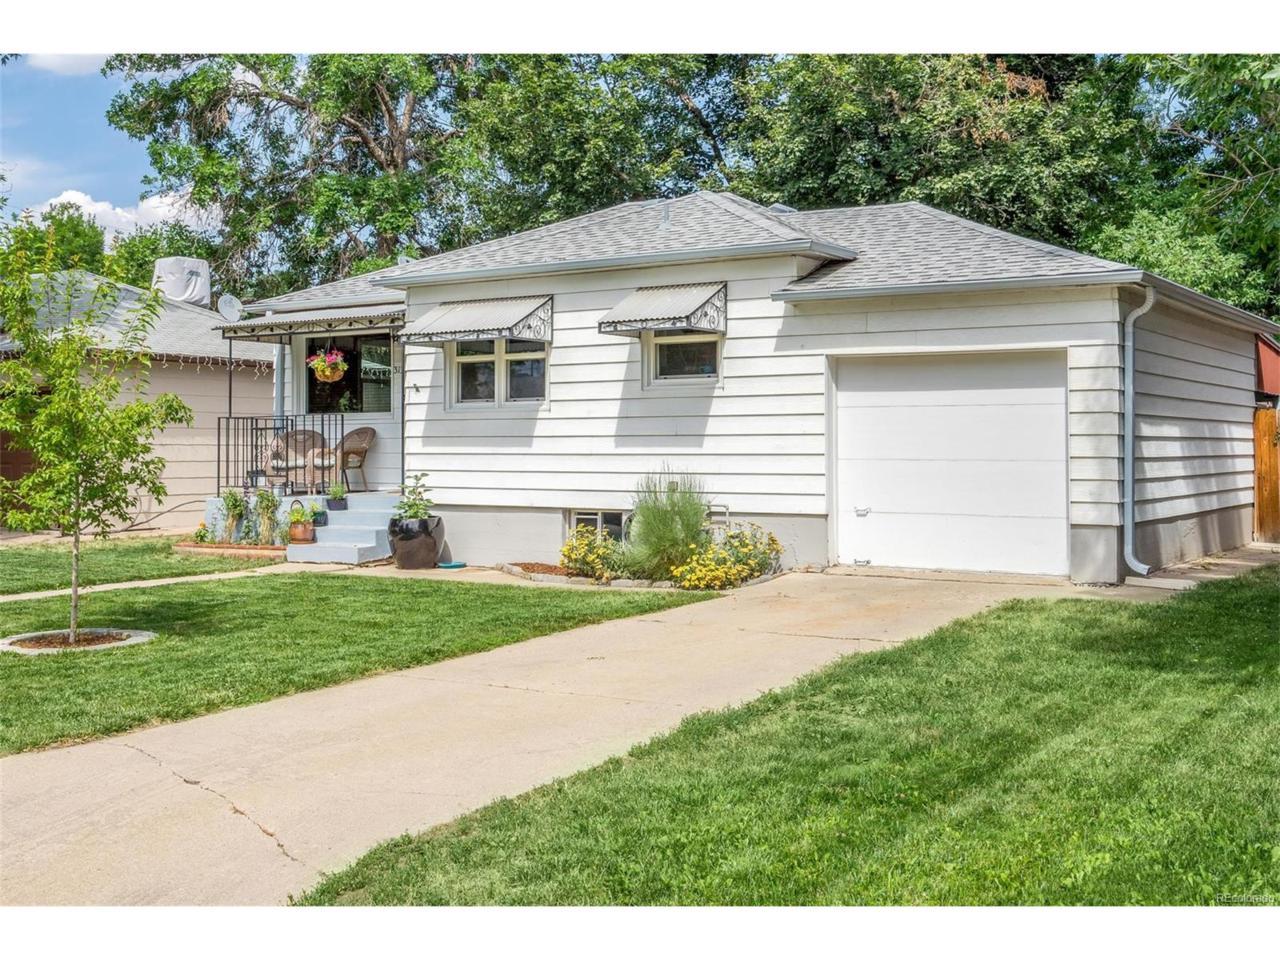 3138 S Fox Street, Englewood, CO 80110 (MLS #4284984) :: 8z Real Estate